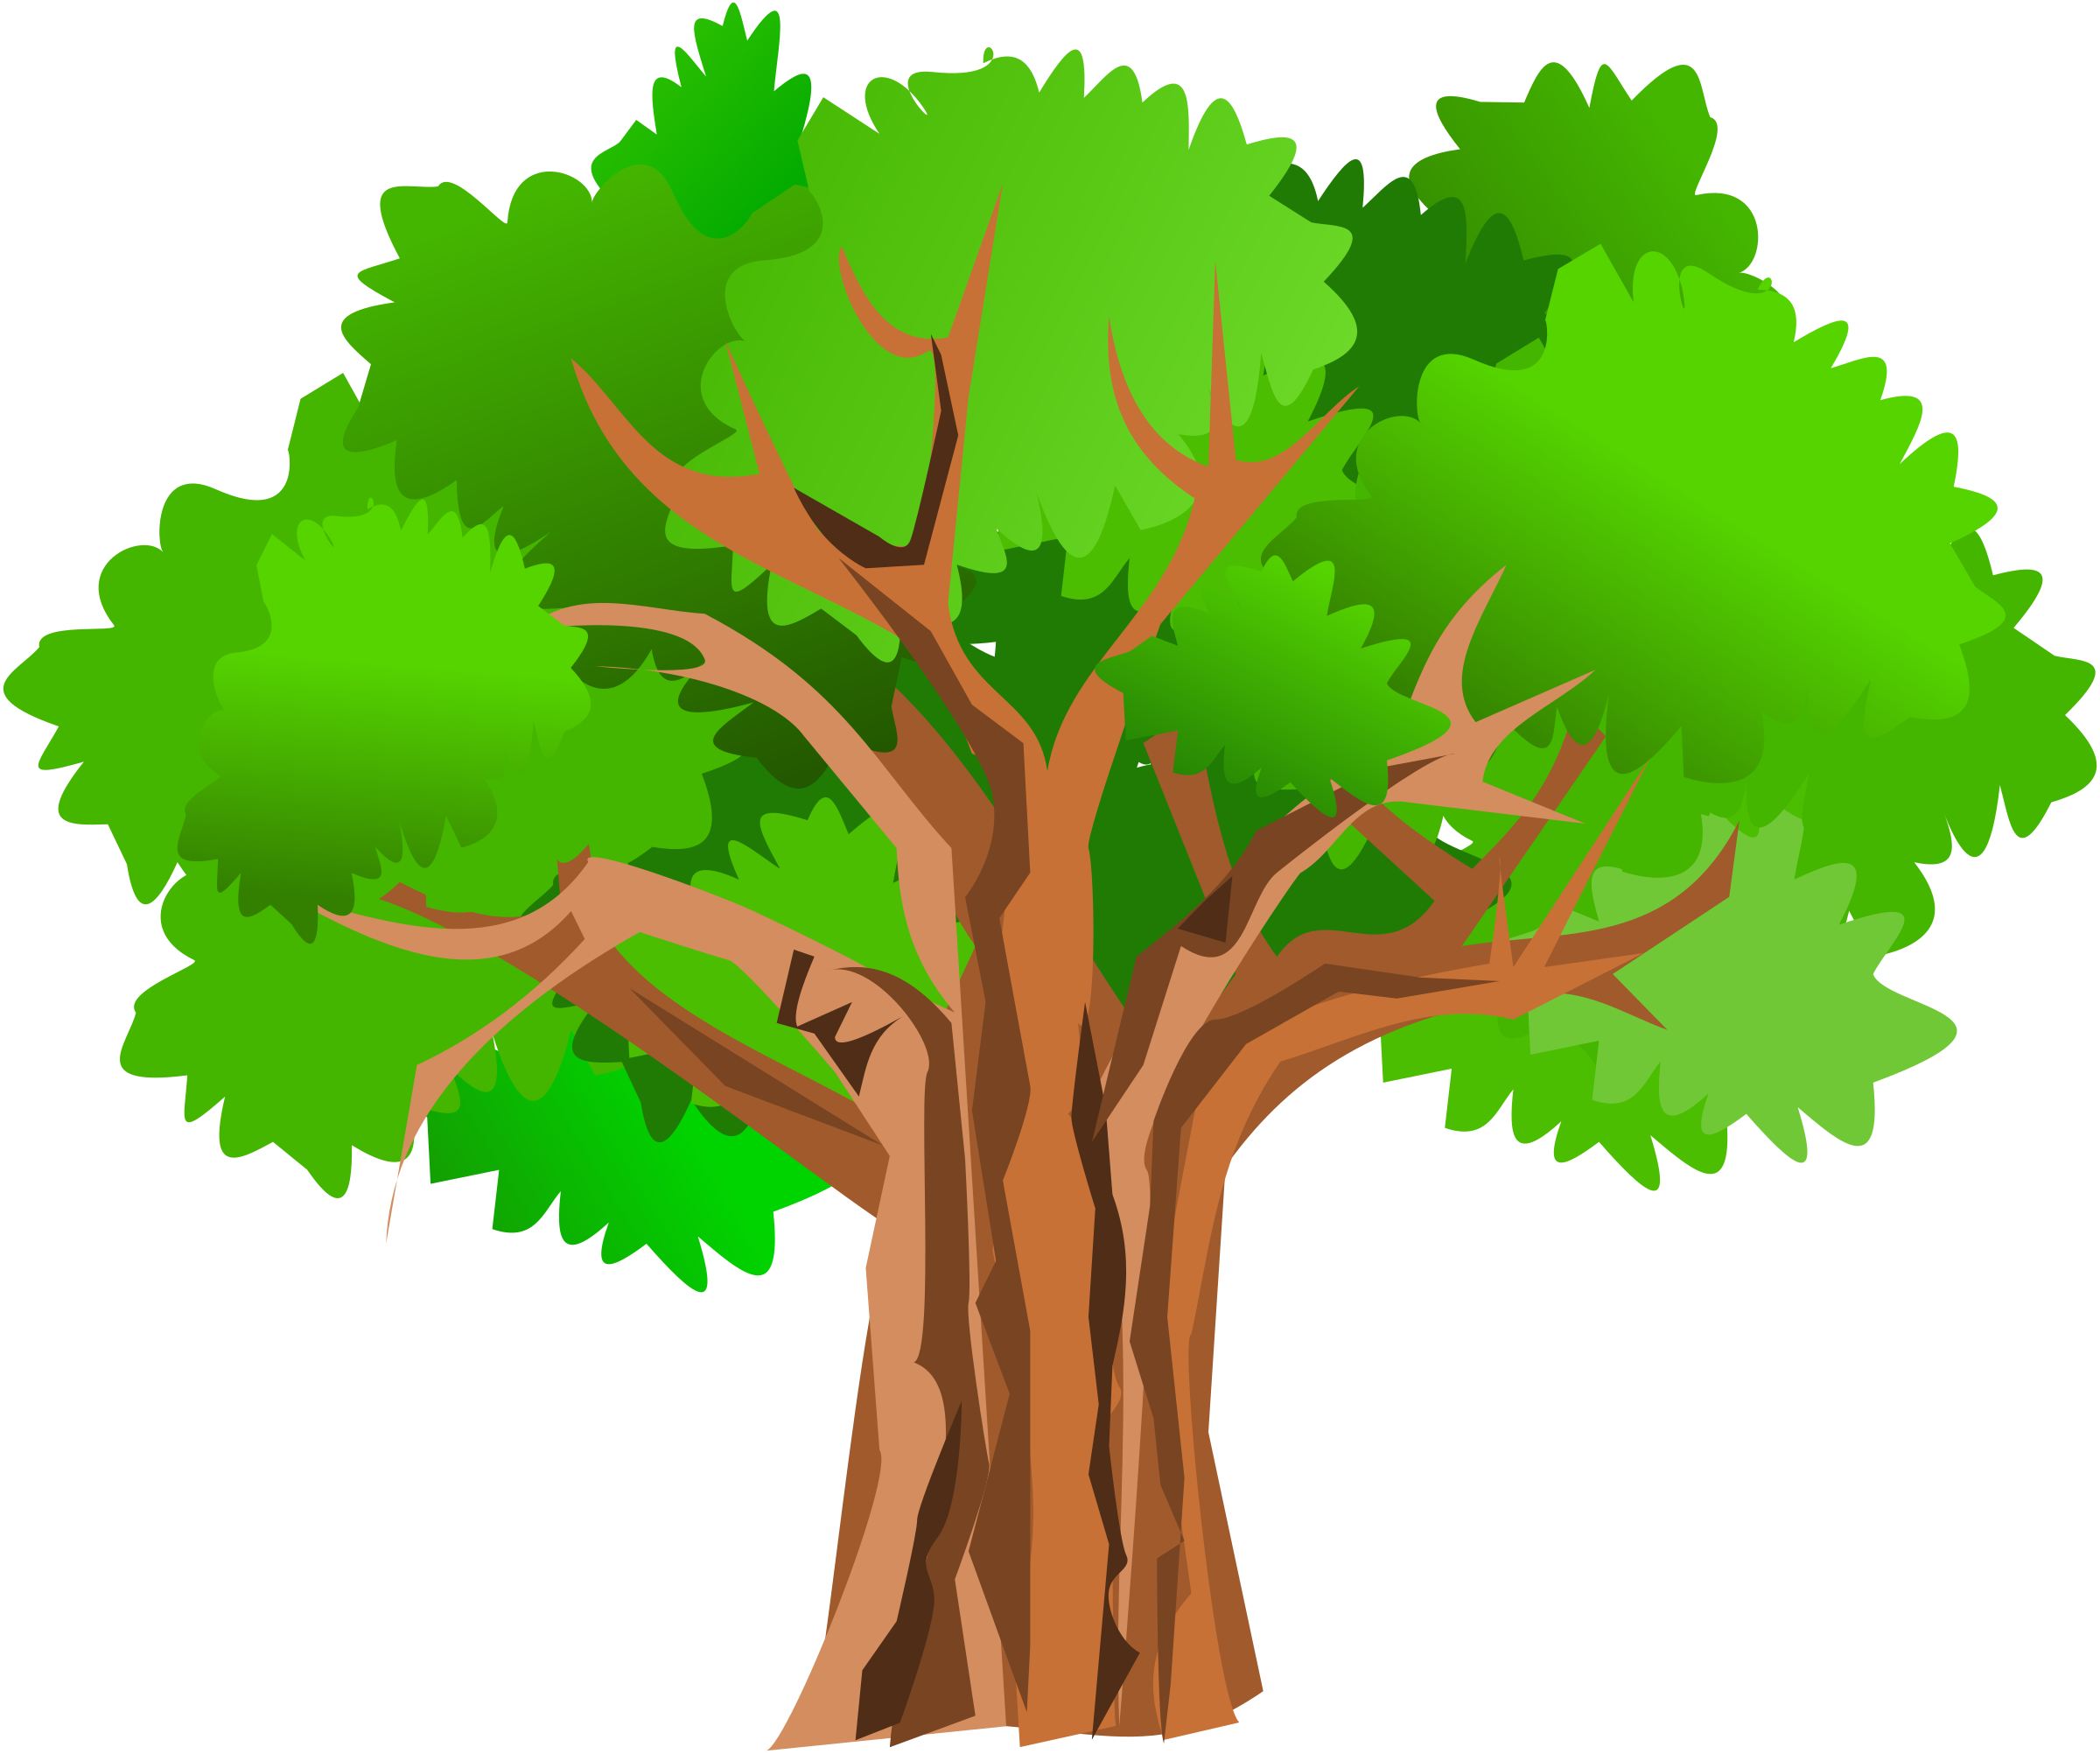 Big image png. Mango clipart tree